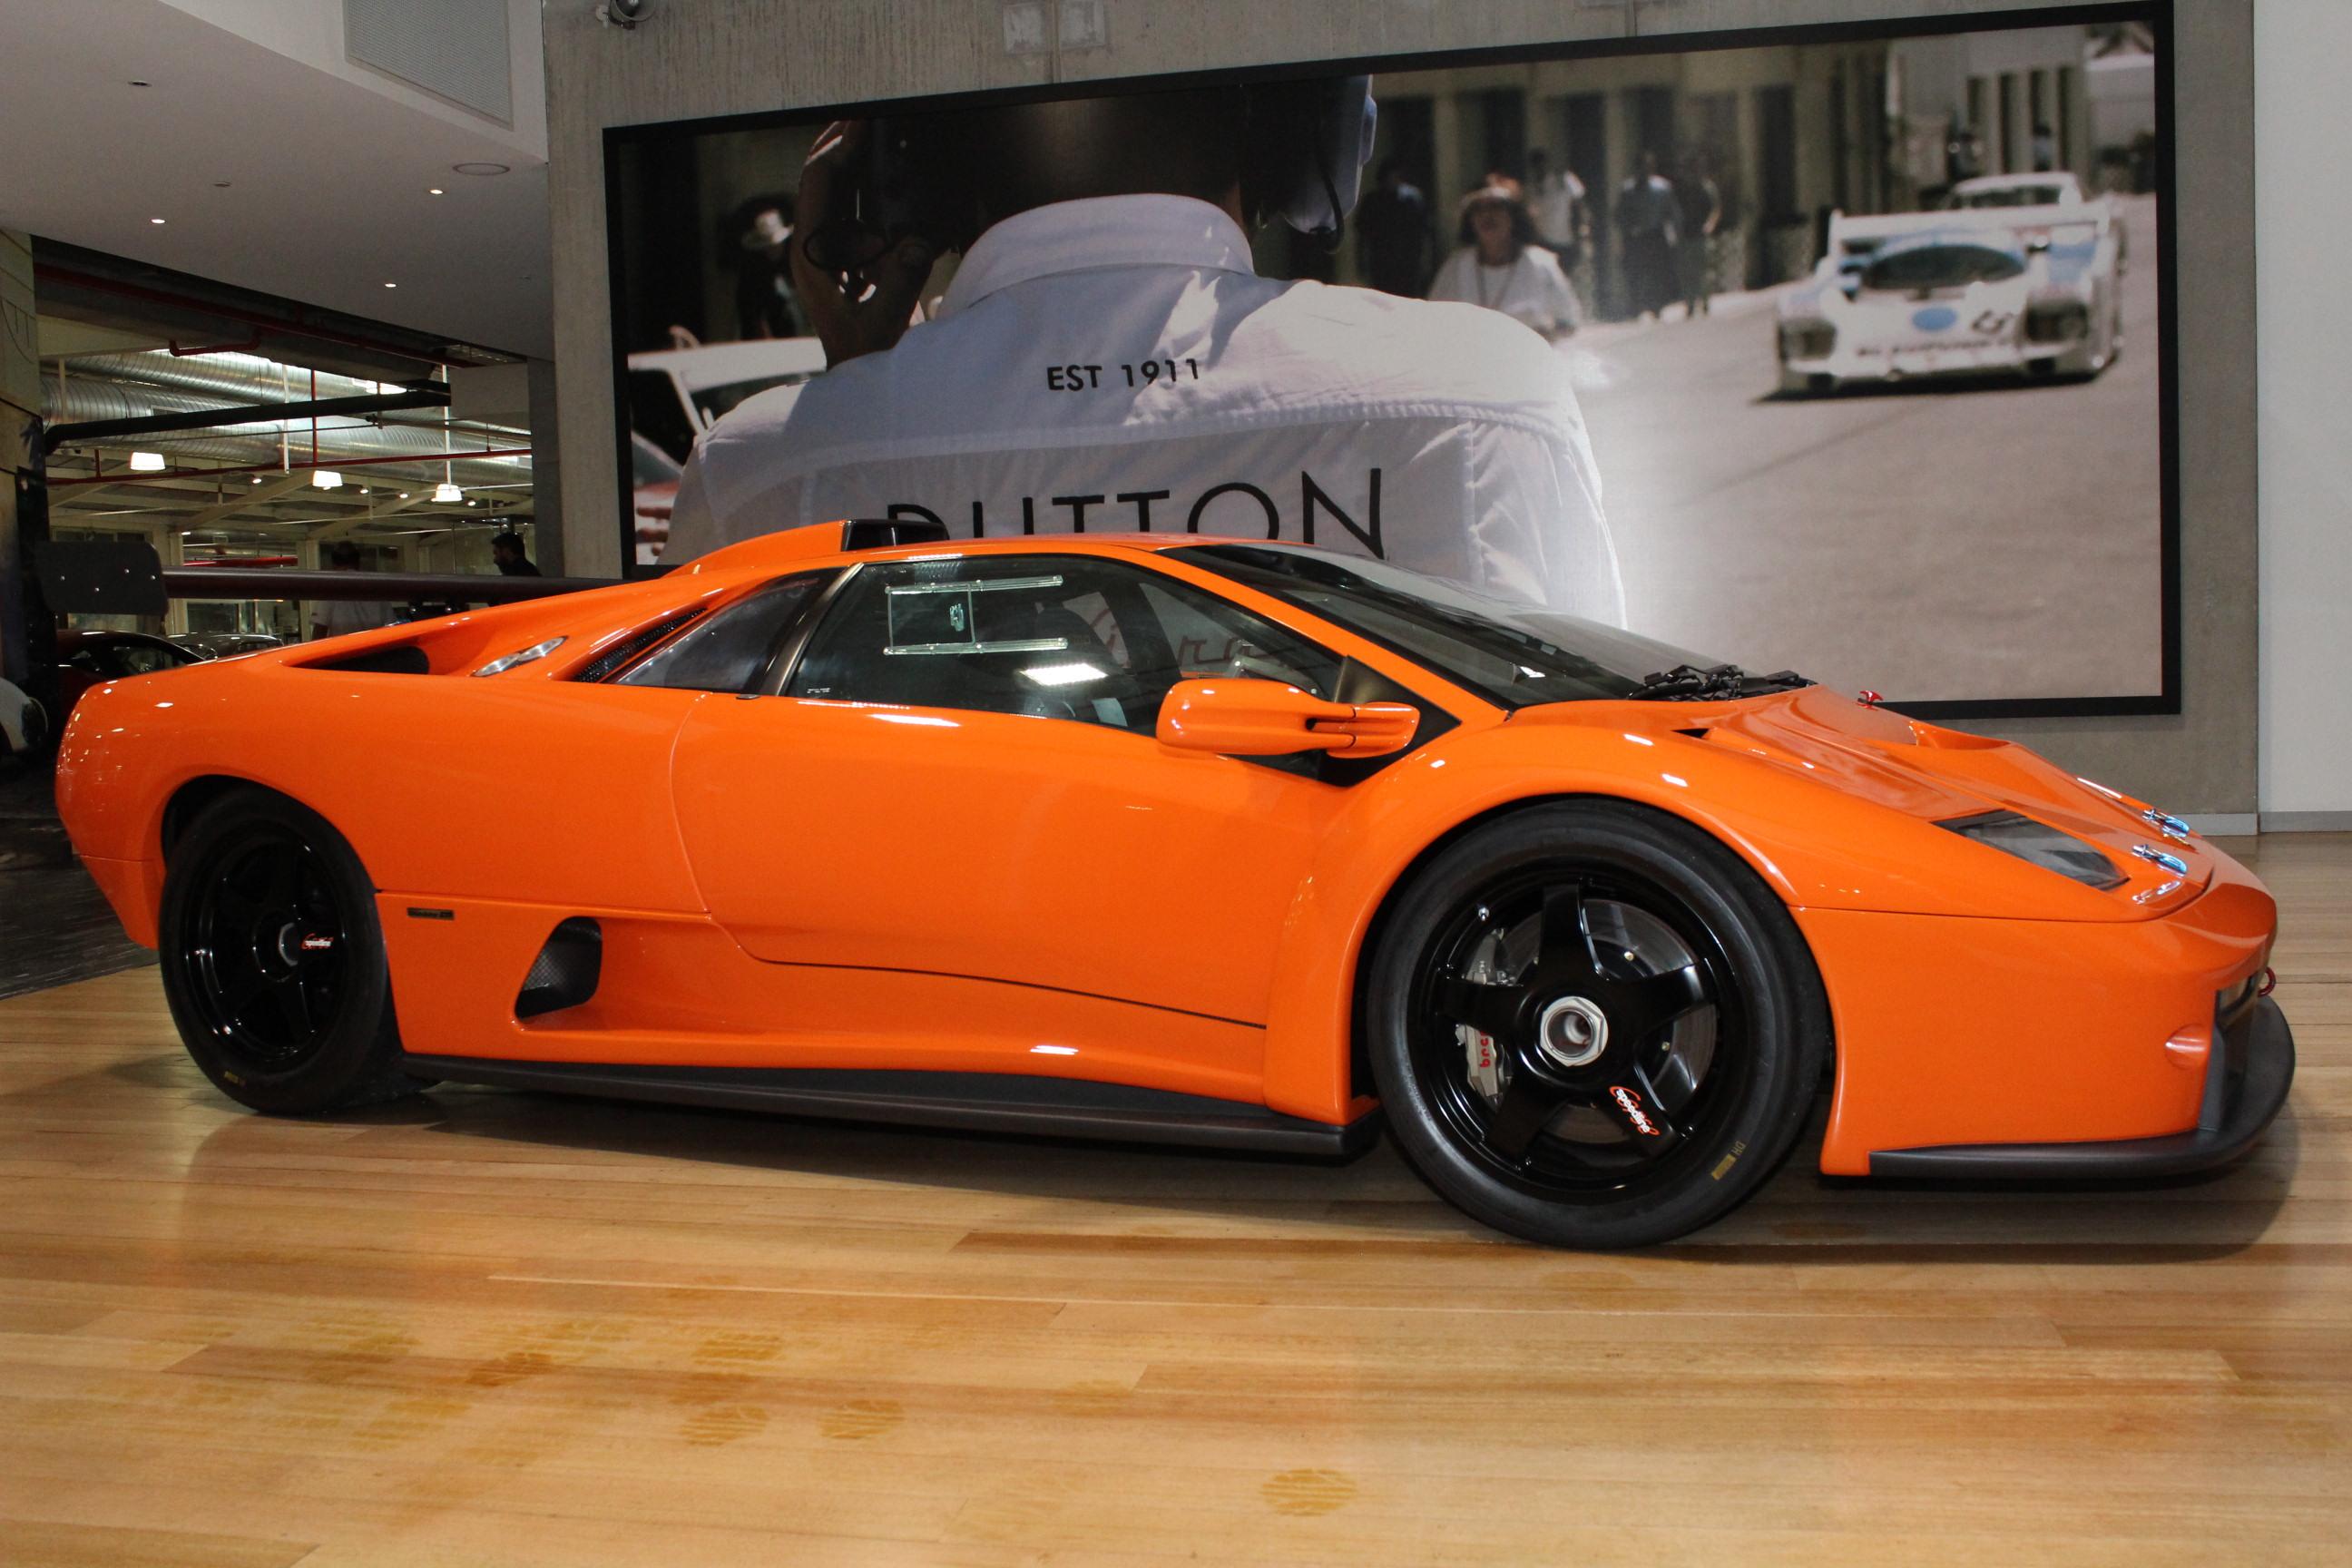 2000 Lamborghini Diablo Gt R